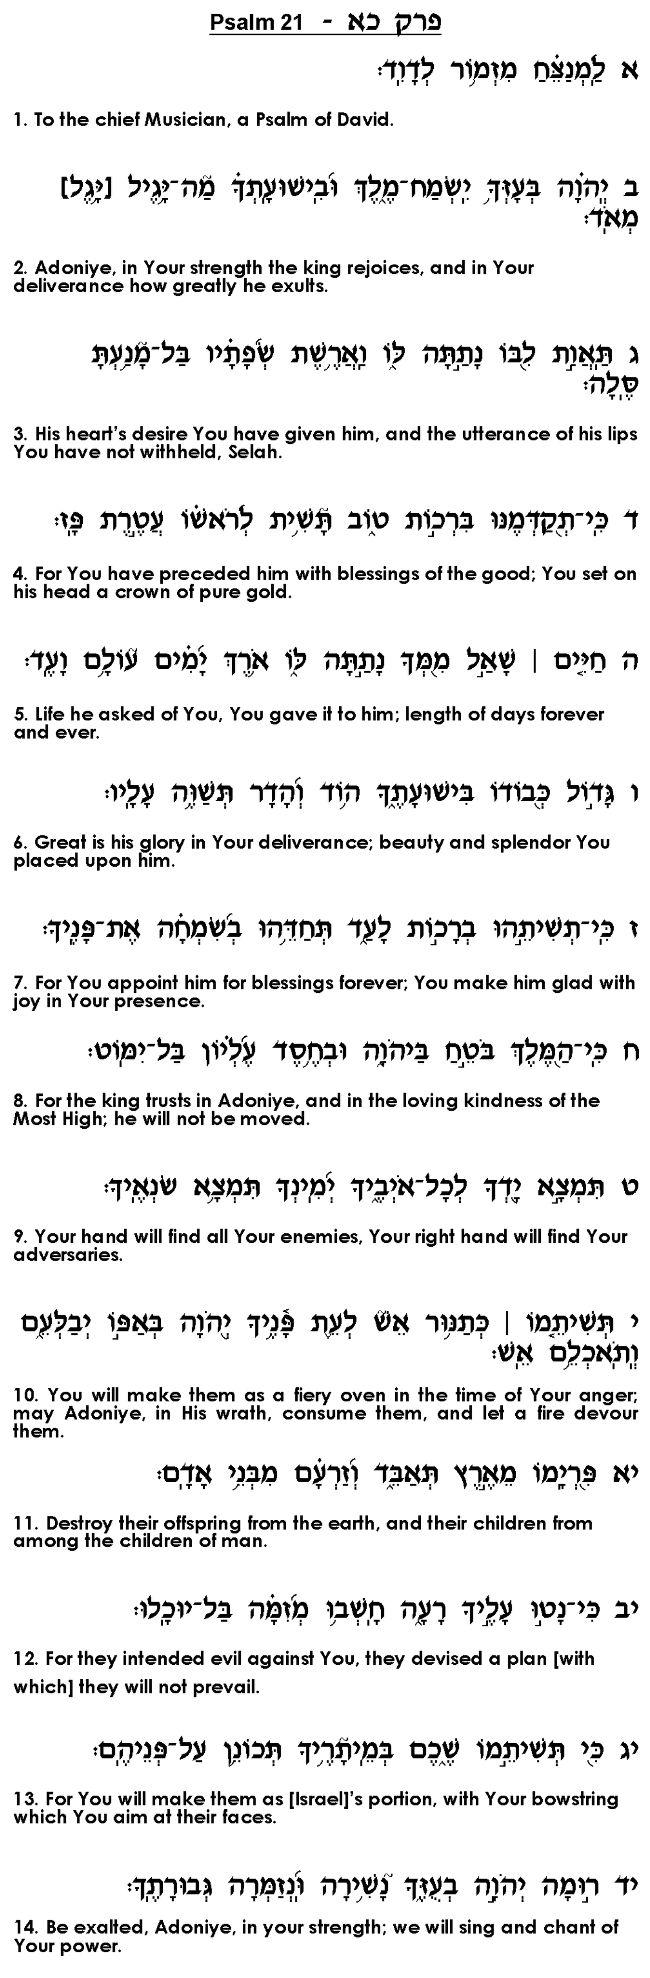 Psalm 21 : God answers prayers!